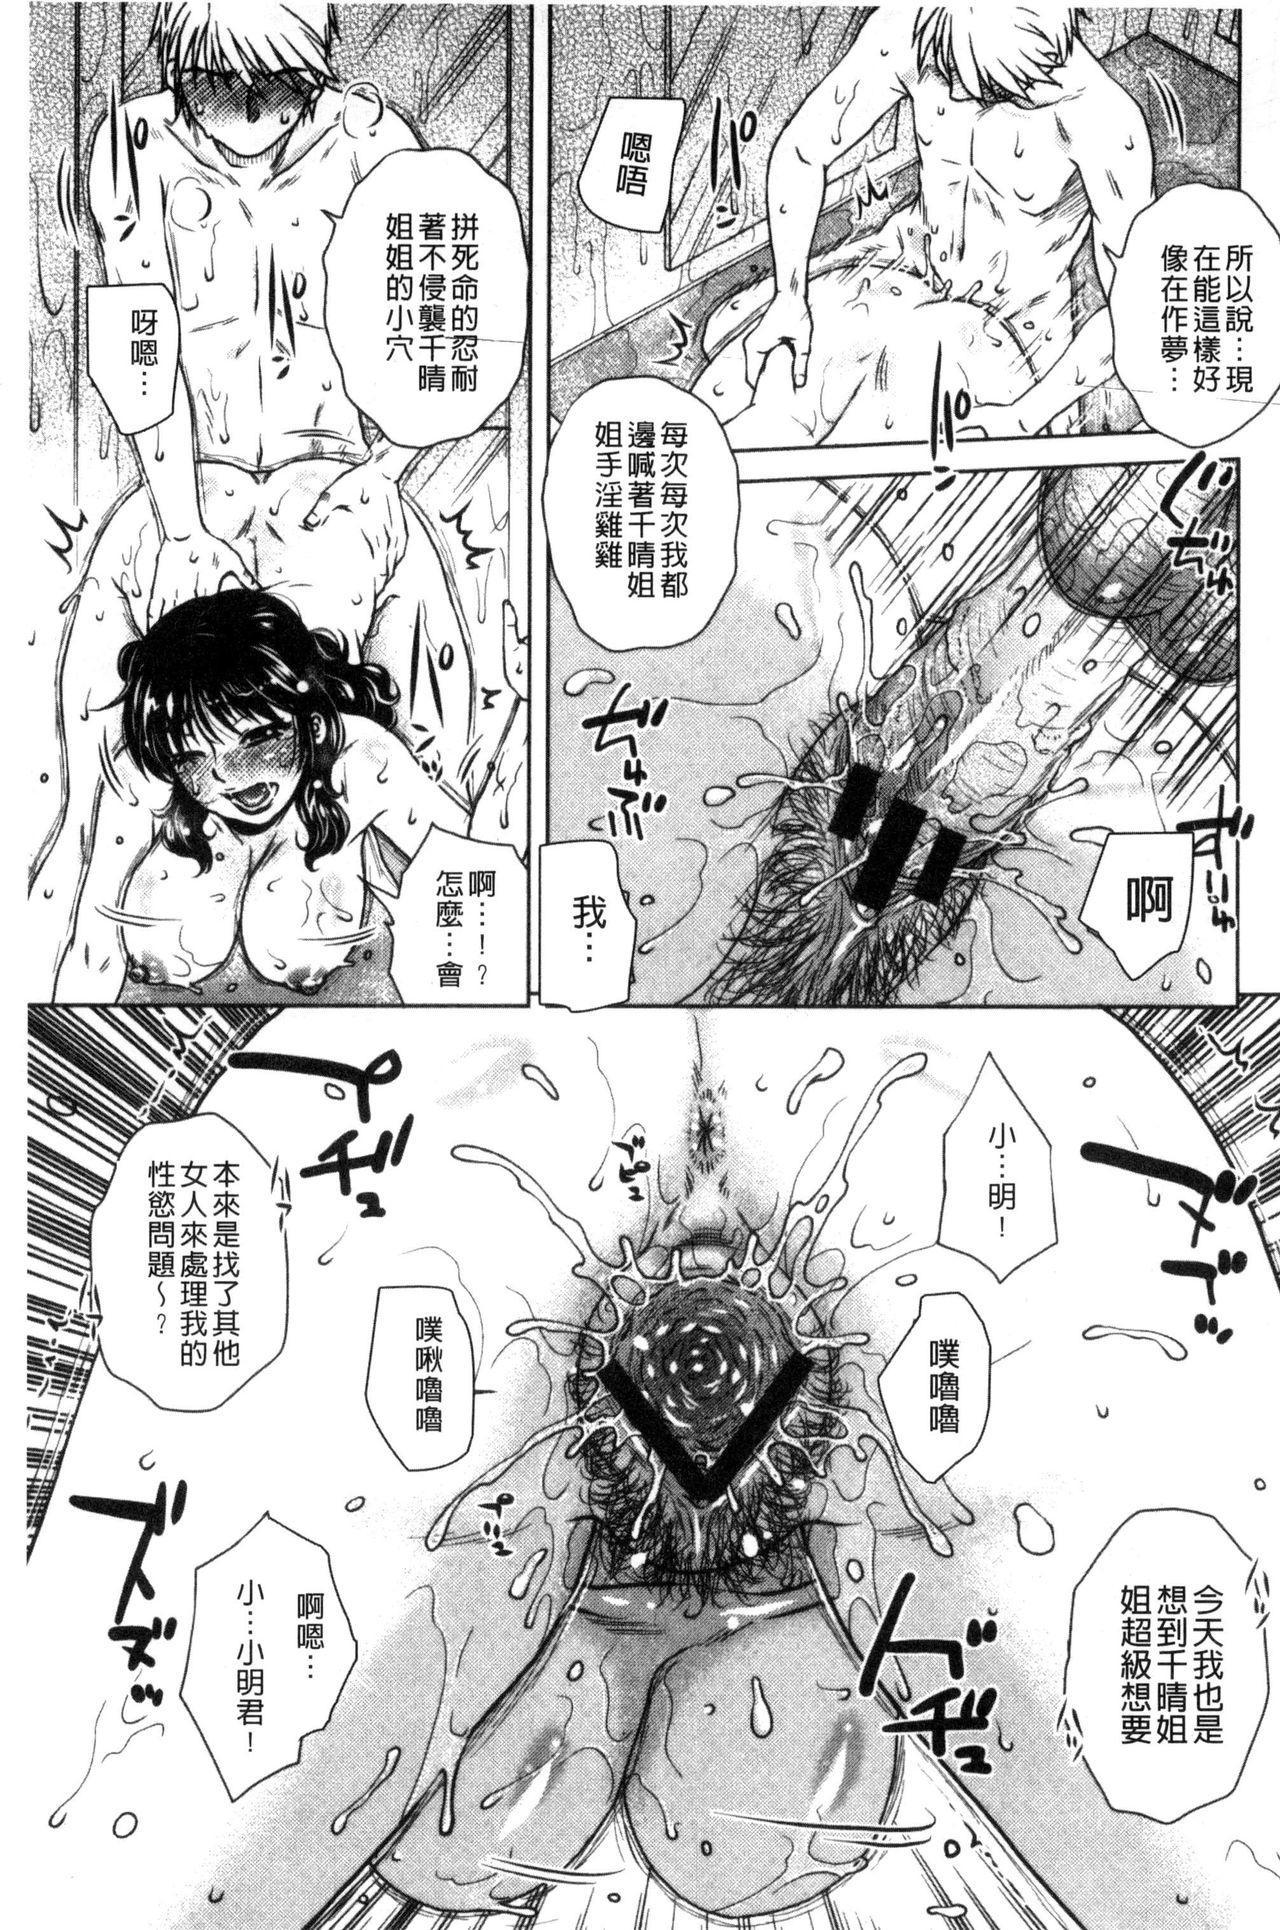 [Kurumiya Mashimin] Uchi no Shachou no Hamedere Inkatsu - Our President is HAME-DERE in Licentious sex life. [Chinese] 181